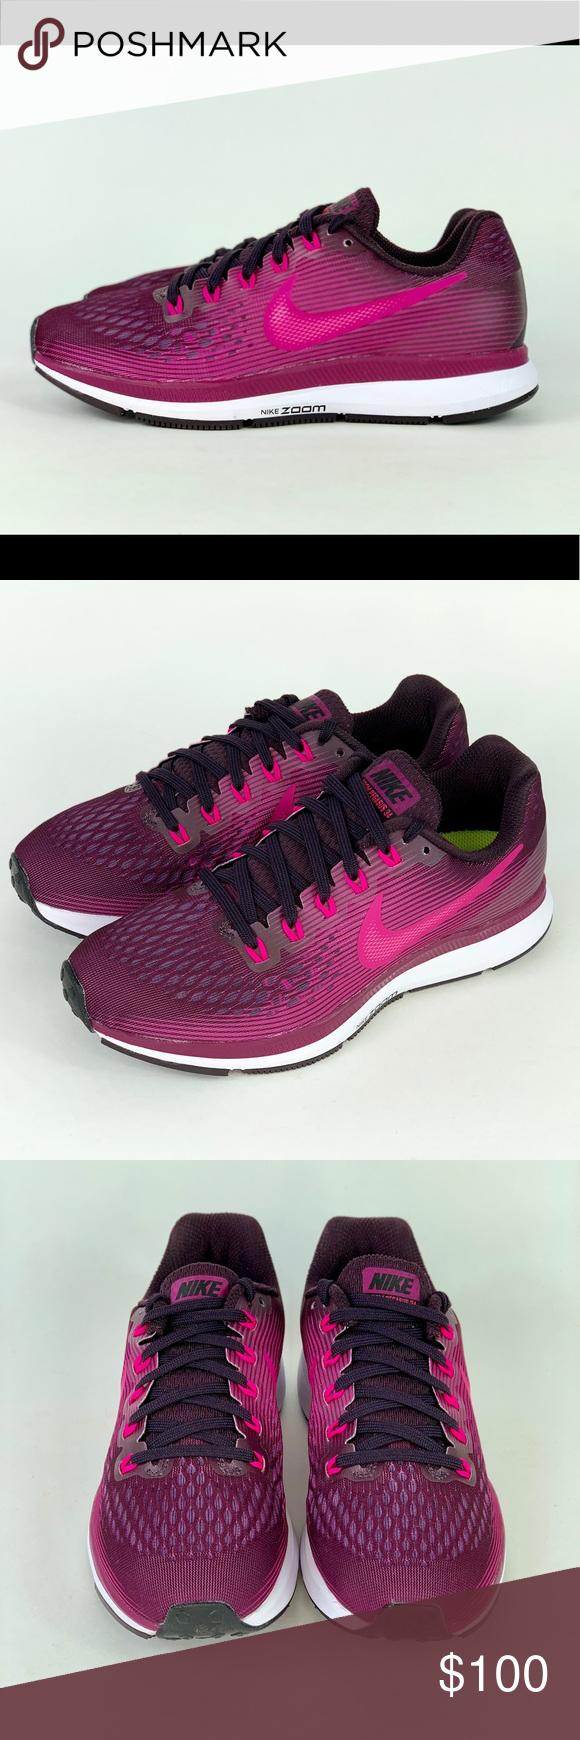 9355f6f1206f7 Nike Air Zoom Pegasus 34 Port Wine Deadly Pink Brand New Nike Air Zoom  Pegasus